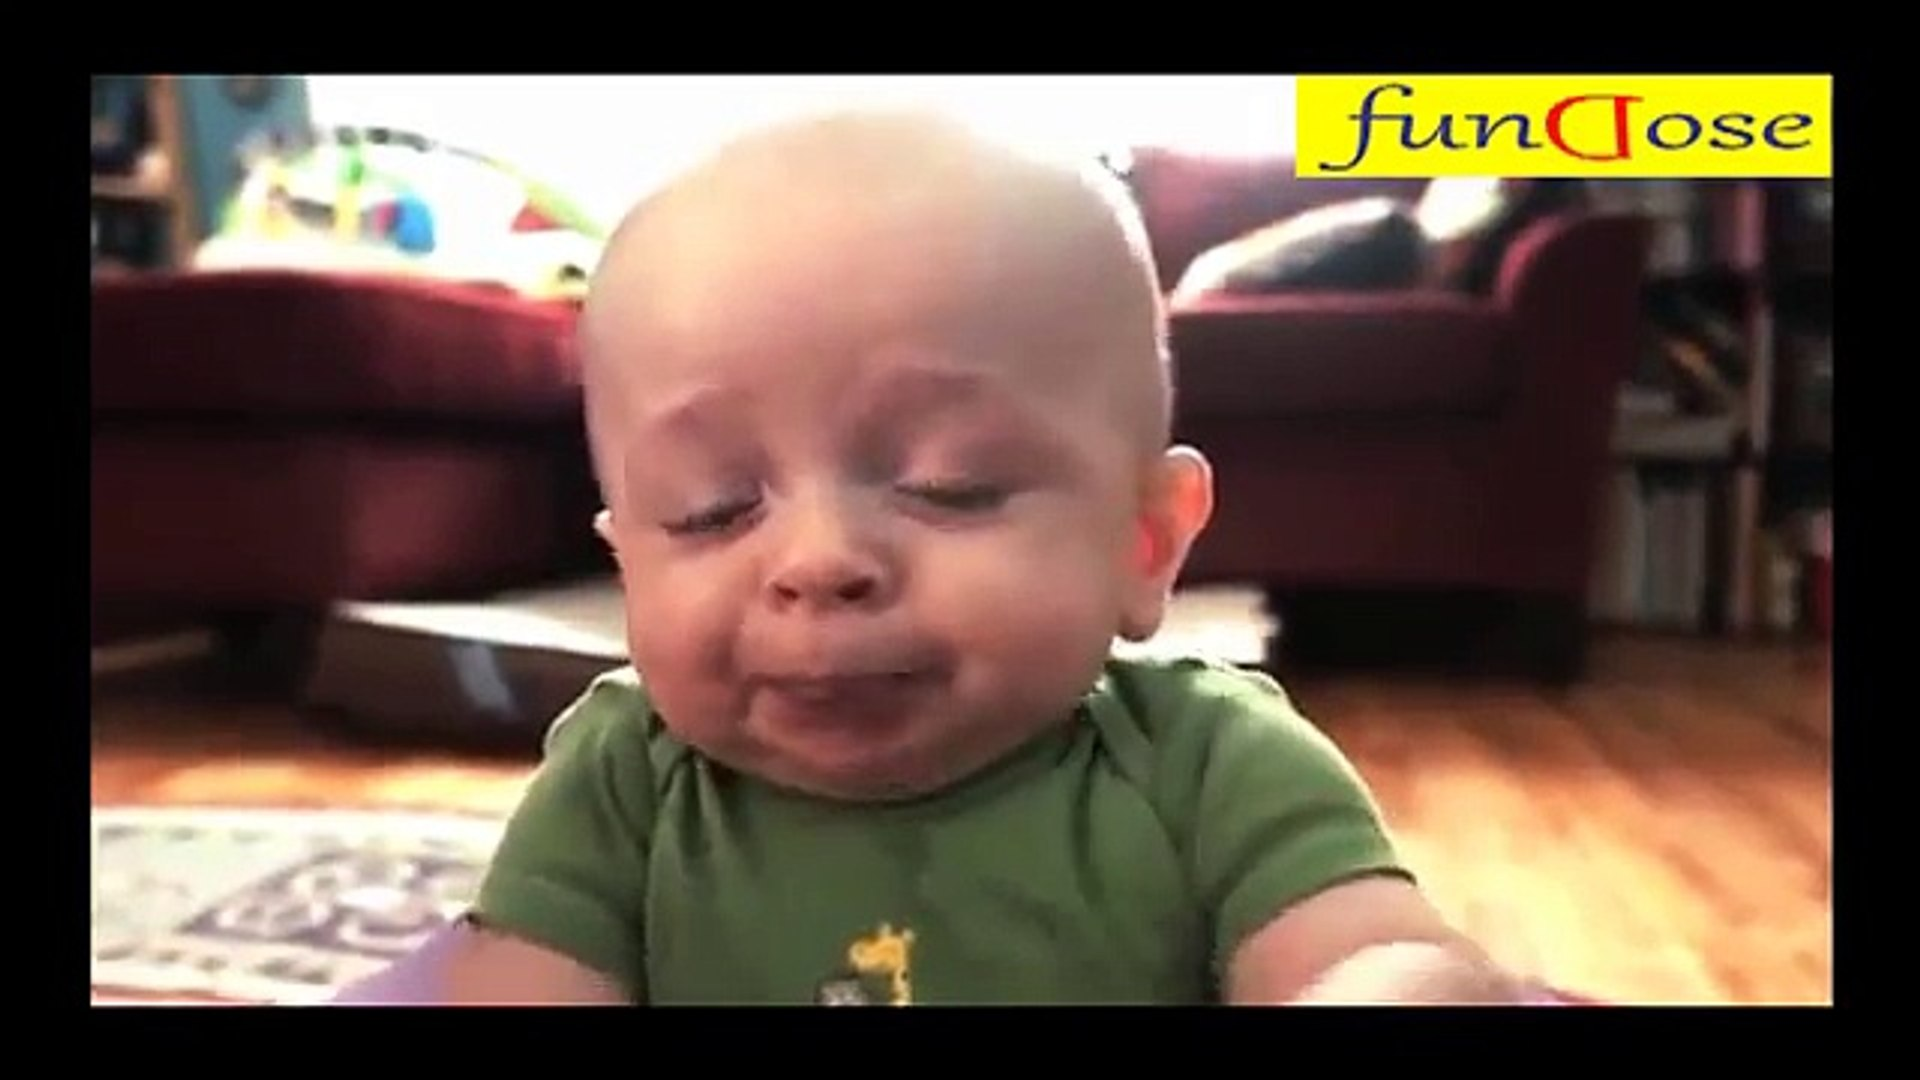 Cute Baby Videos Funny | Cute Baby | 2016